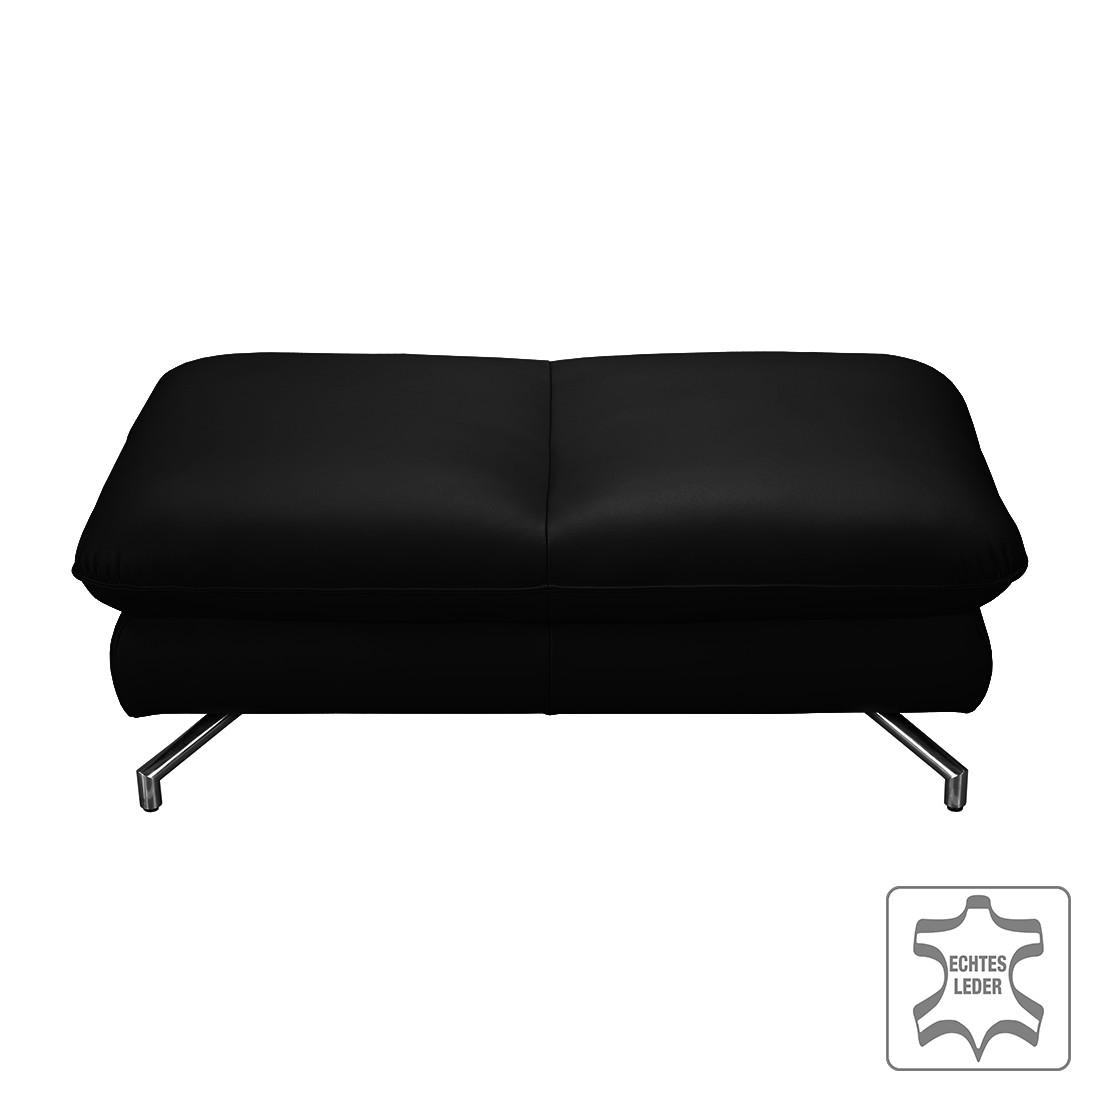 Home 24 - Repose-pieds sharon - cuir véritable - noir, loftscape